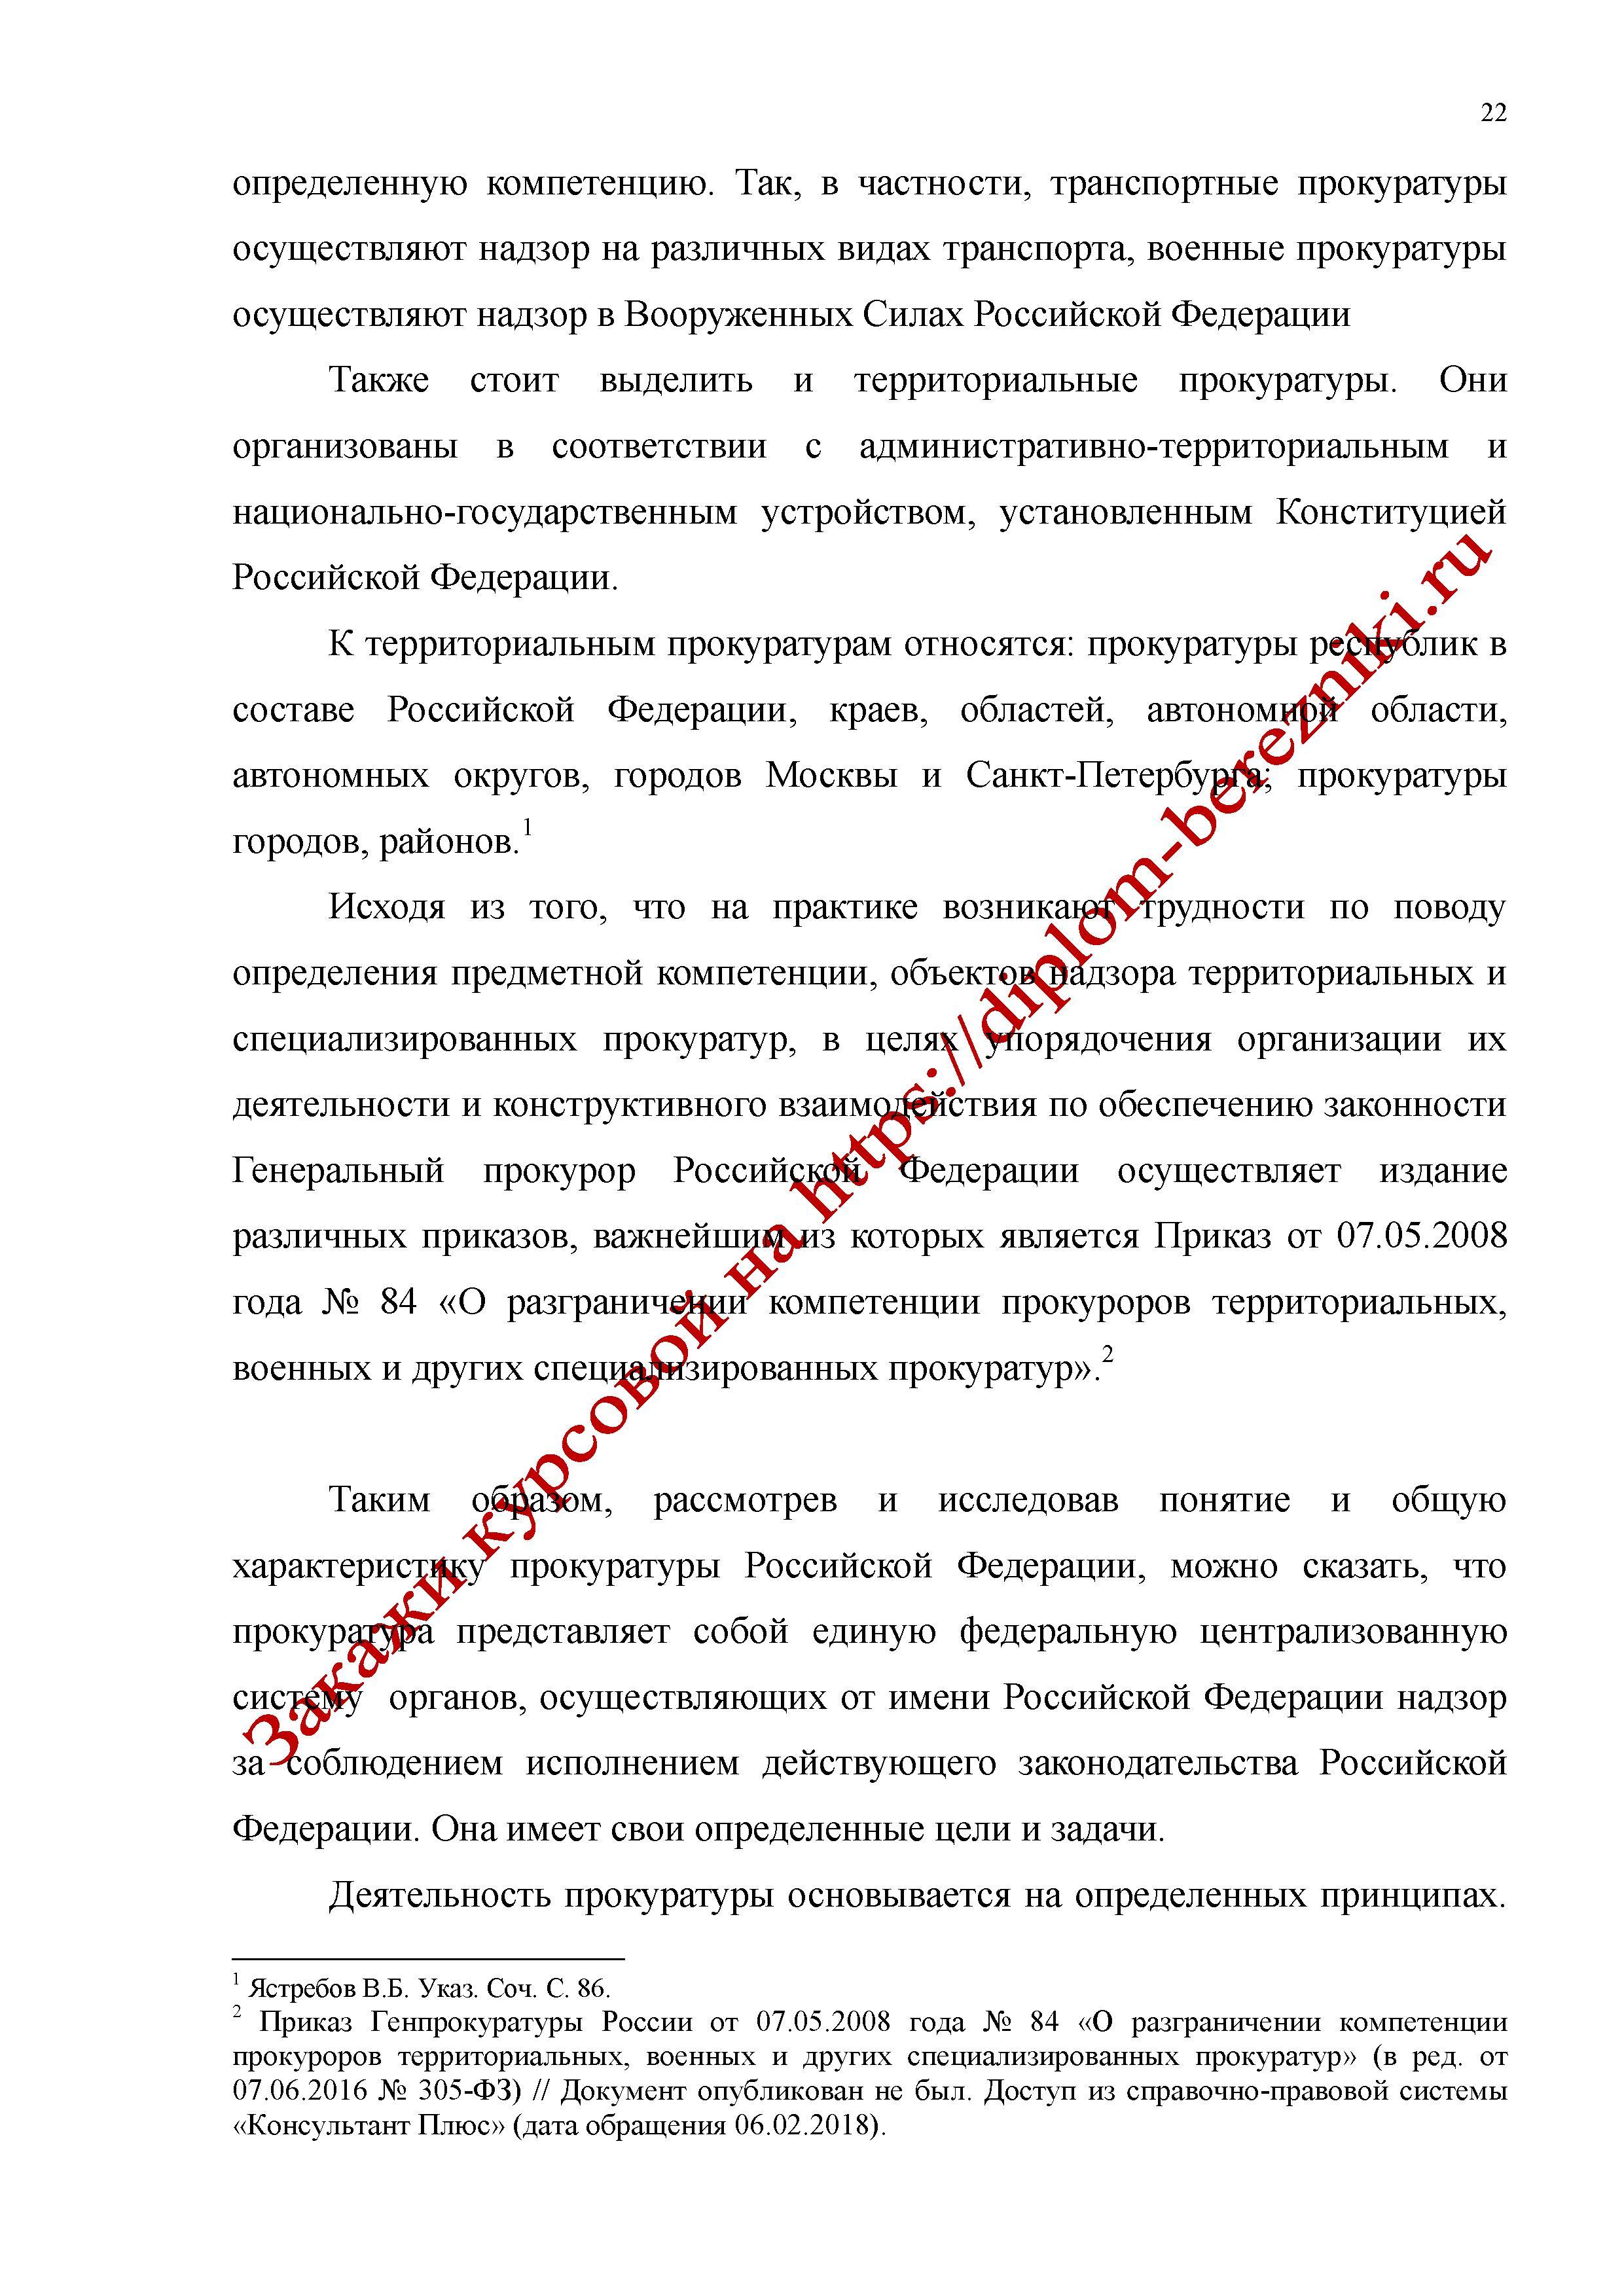 Конституции РФ цели